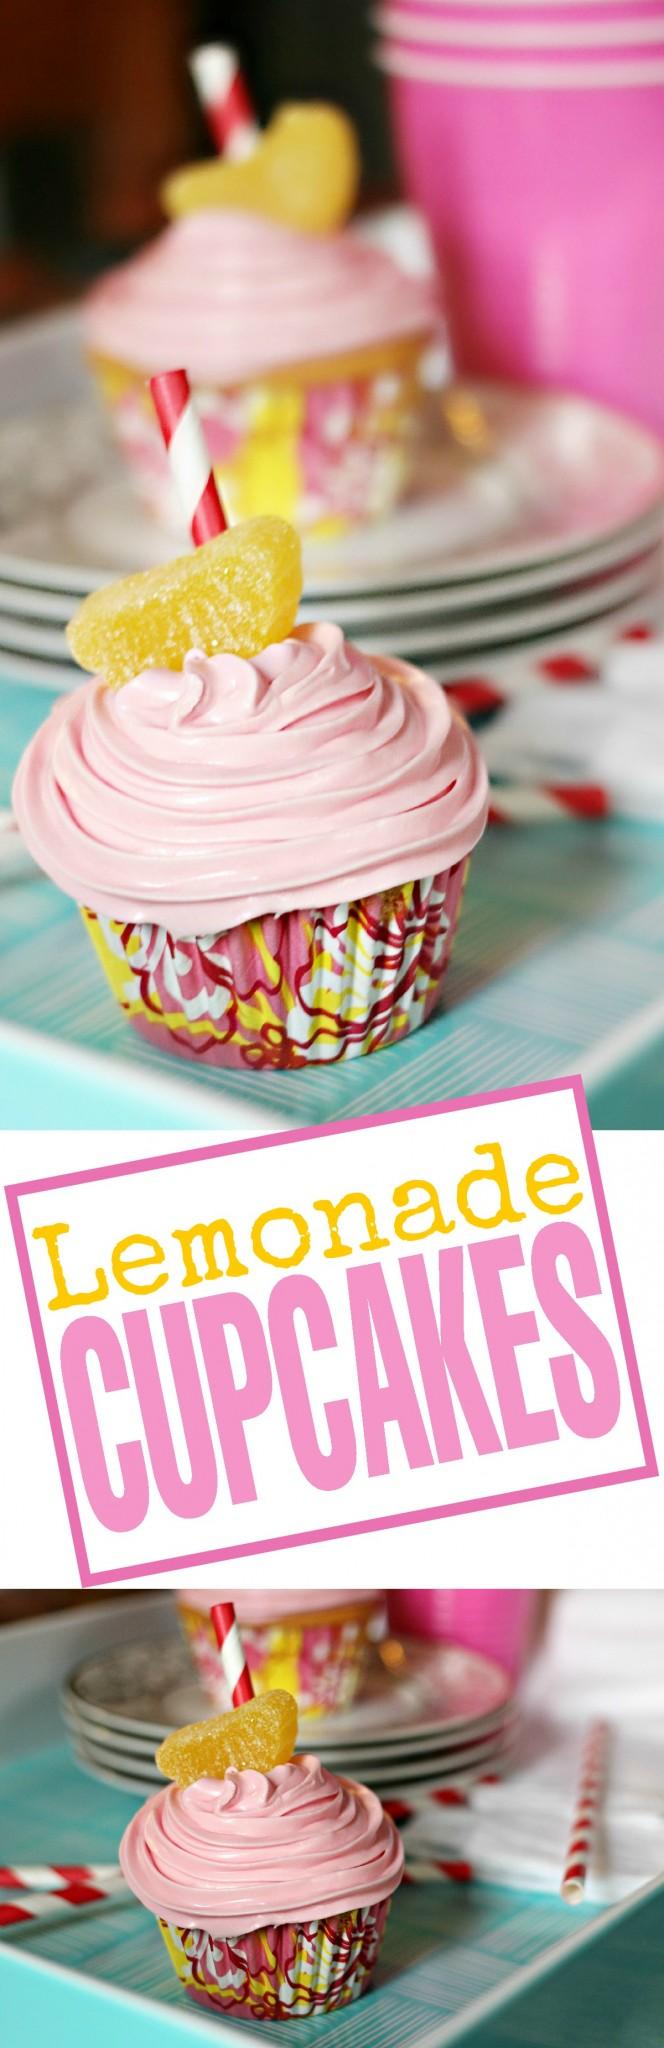 Aren't these Pink Lemonade Cupcakes super cute? This recipe makes a luscious lemon flavoured cupcake.